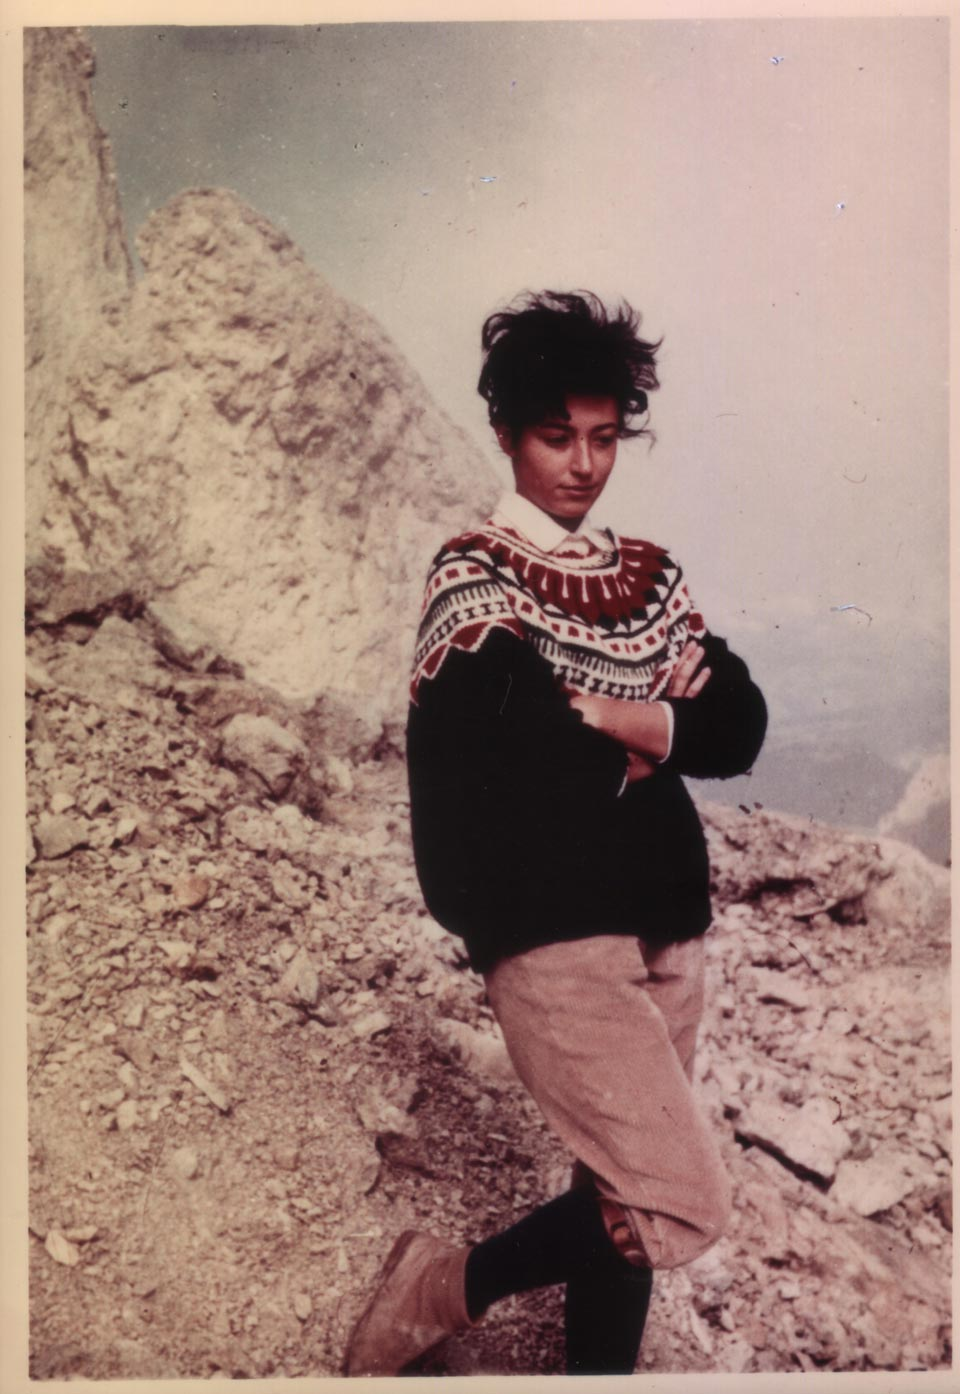 S. Caterina. Escursione geologica in Sardegna.